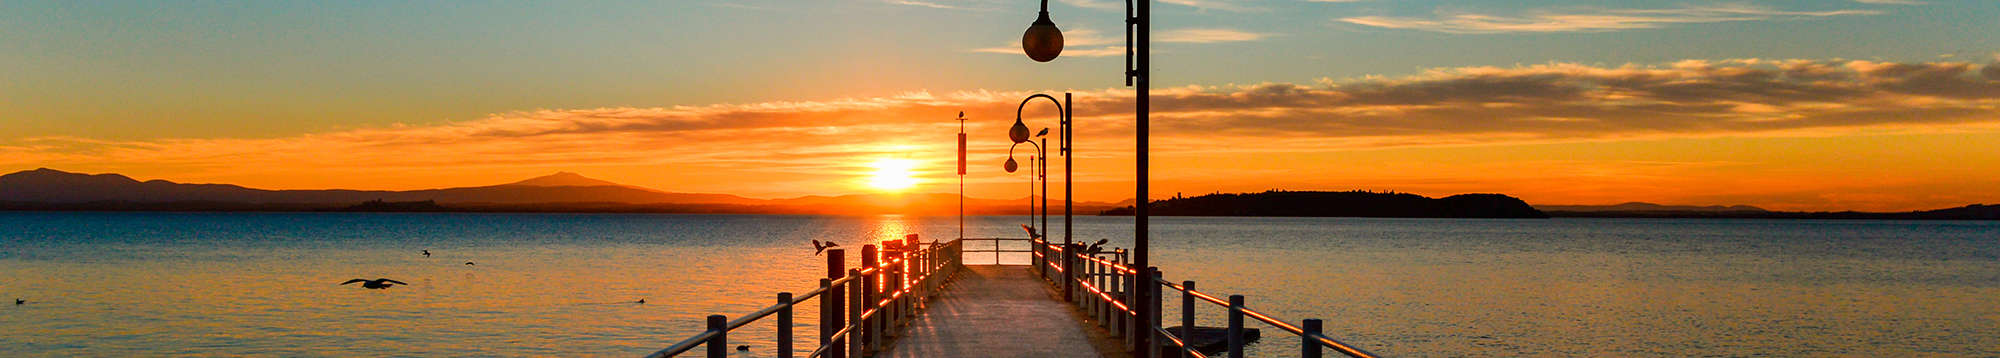 Week end e soggiorni al Lago Trasimeno